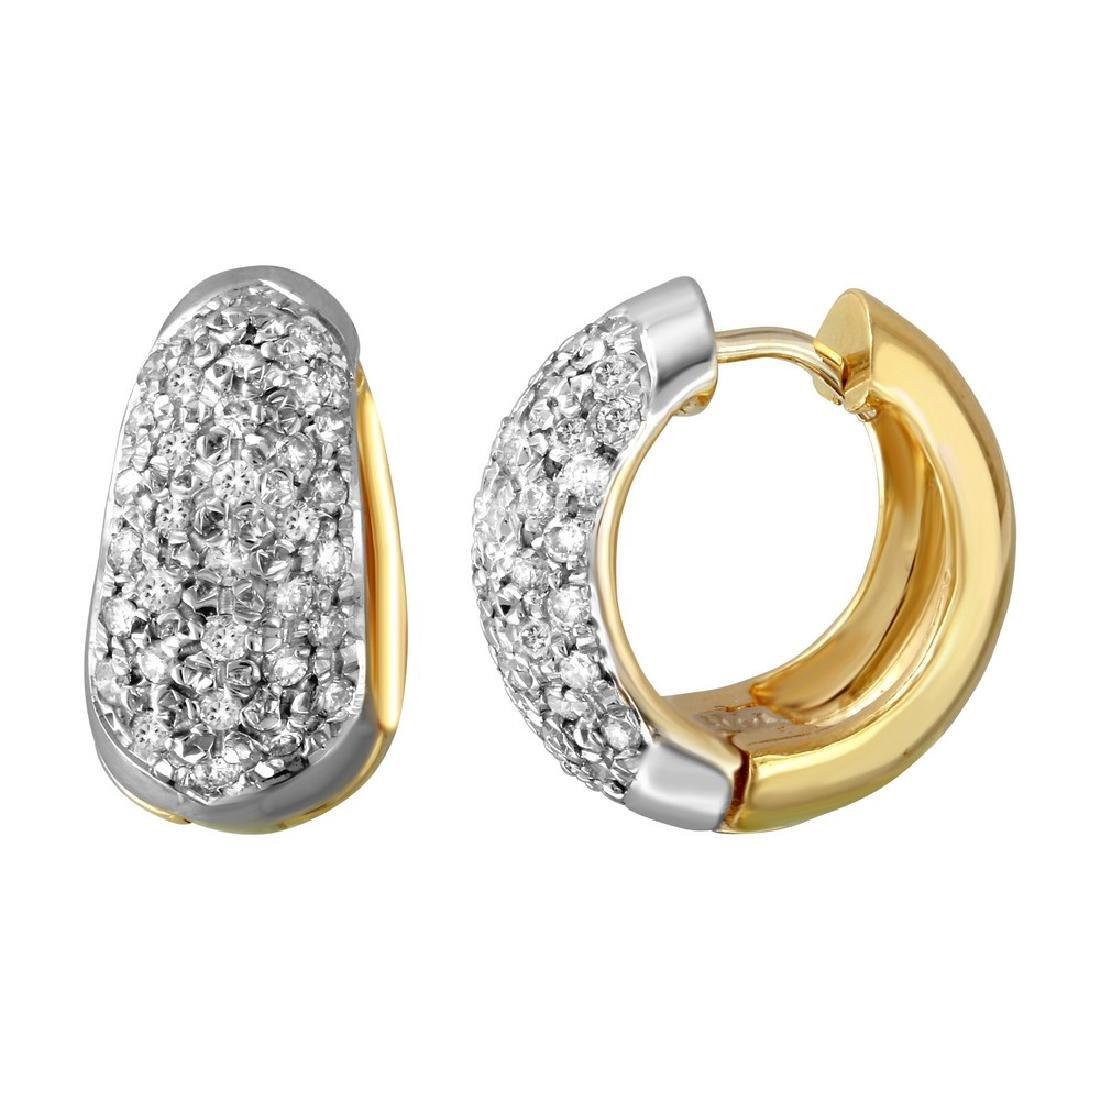 Genuine 2 TCW 14K Two Tone Gold Ladies Earring